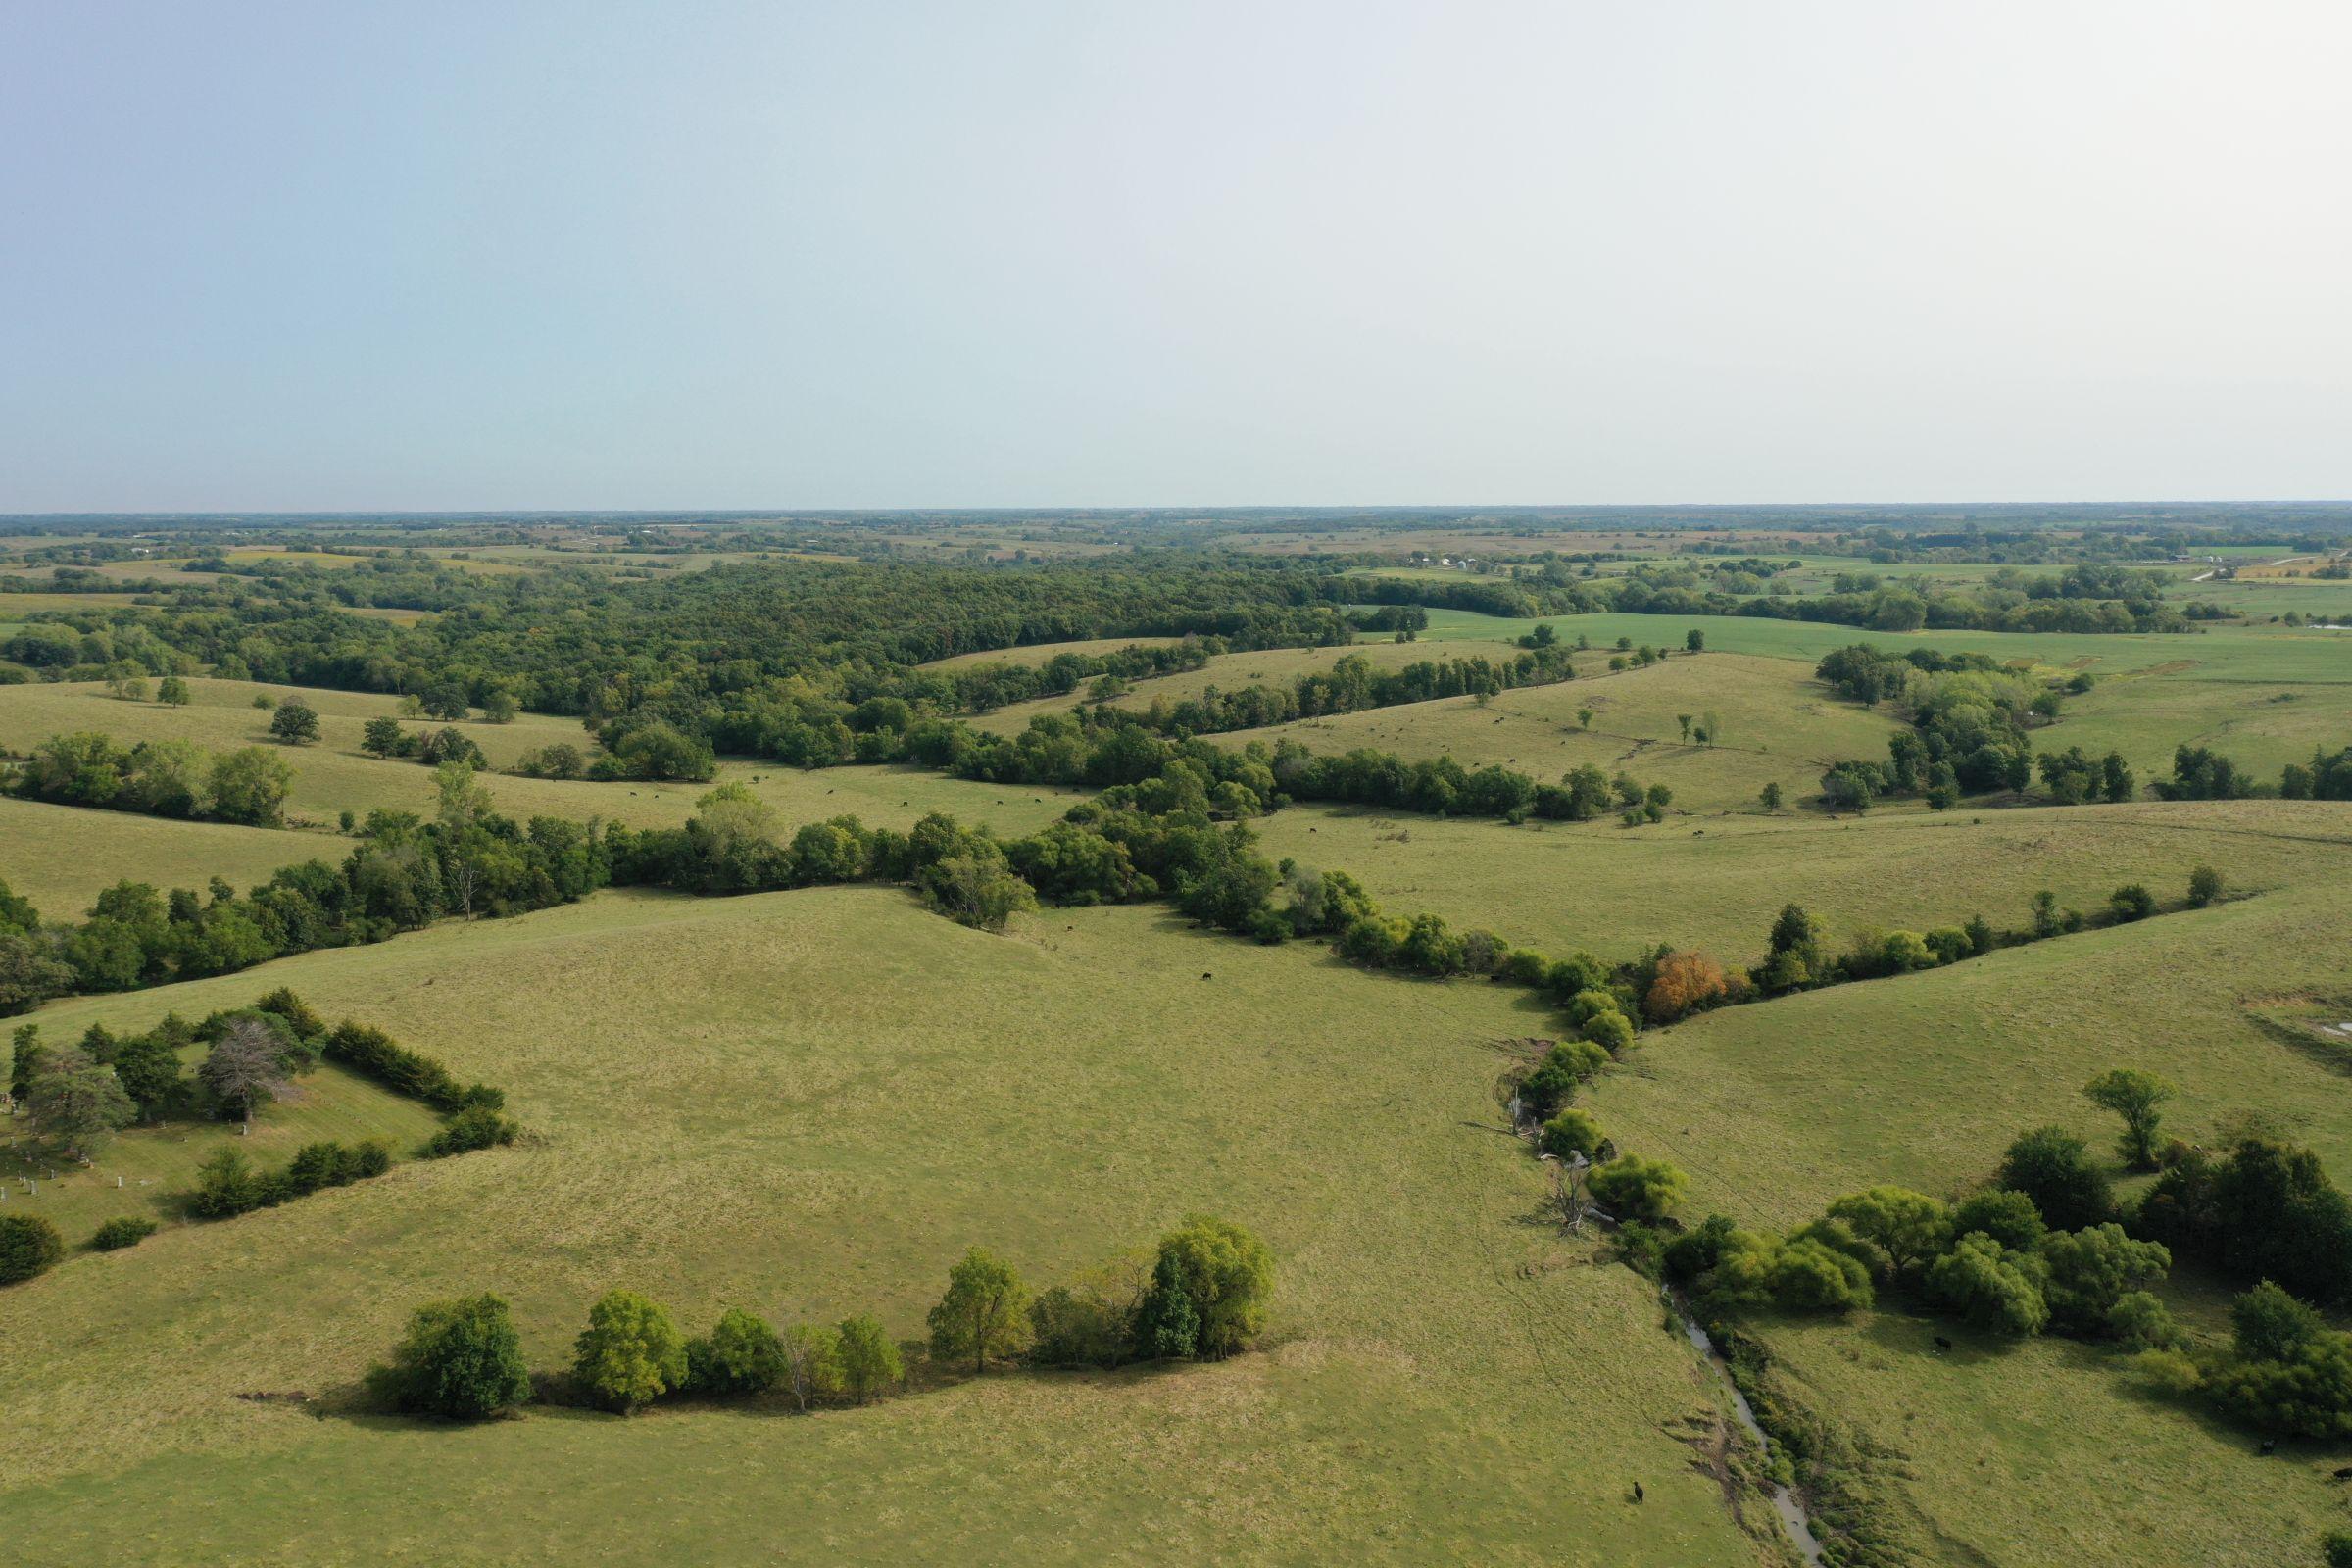 land-clarke-county-iowa-196-acres-listing-number-15176-2-2020-09-16-222321.jpg